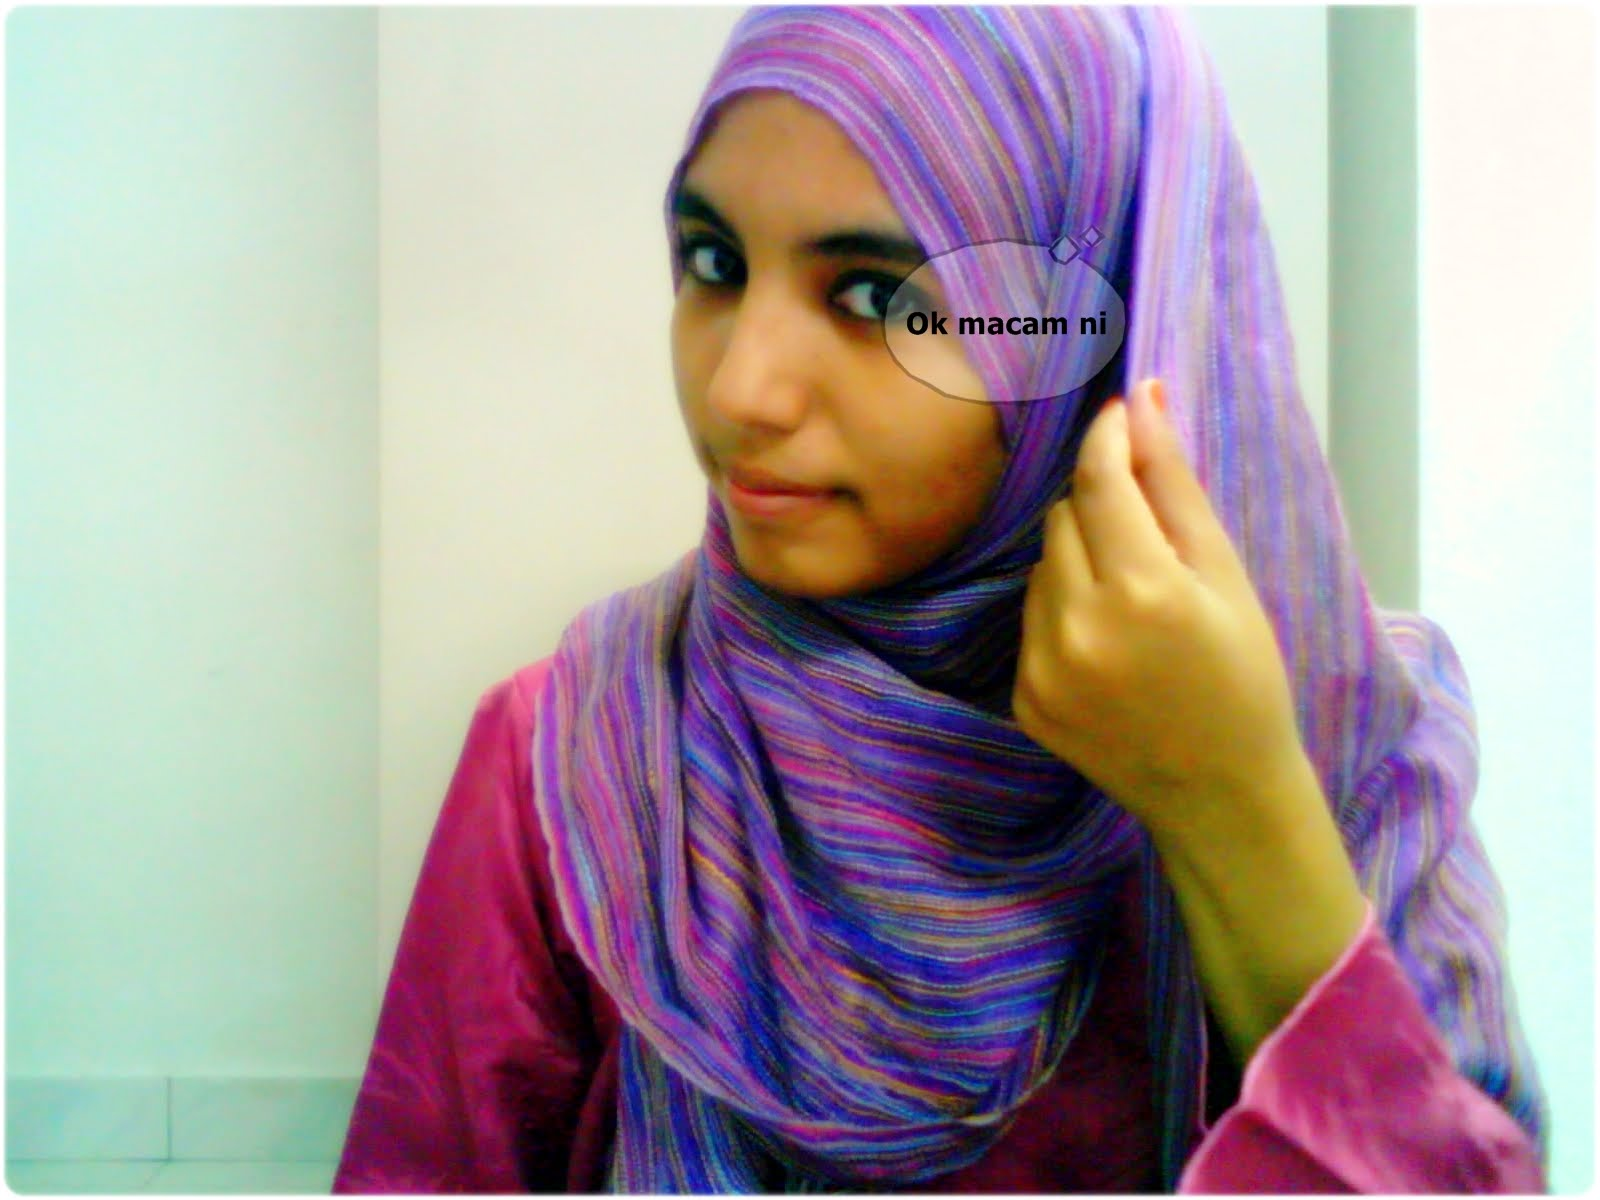 Cara Memakai Shawl Pashmina Gaya Gadis Arab ~ ScaniaZ